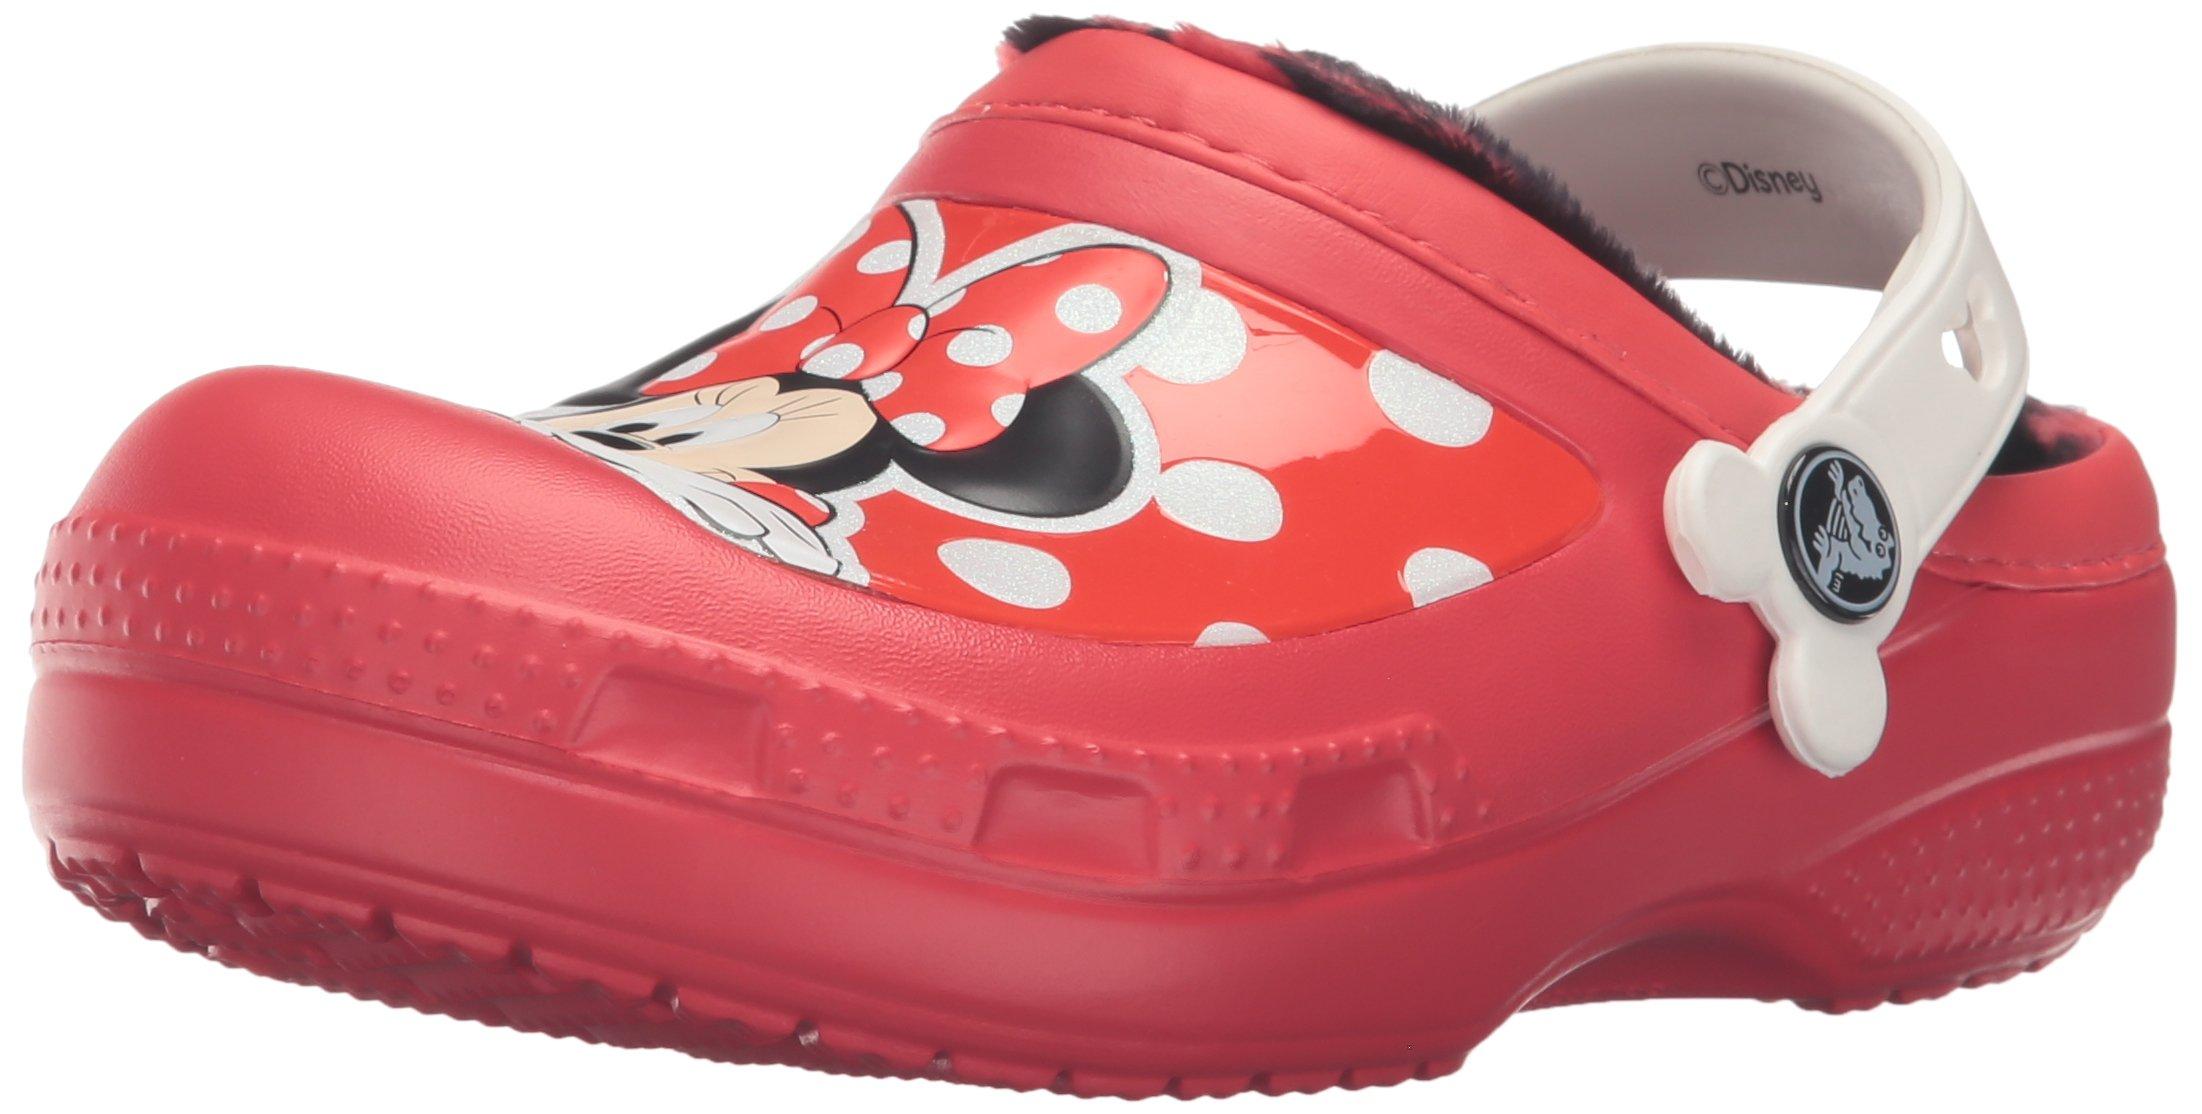 Crocs CC Minnie Lined Clog (Toddler/Little Kid), Pepper, 12/13 M US Little Kid